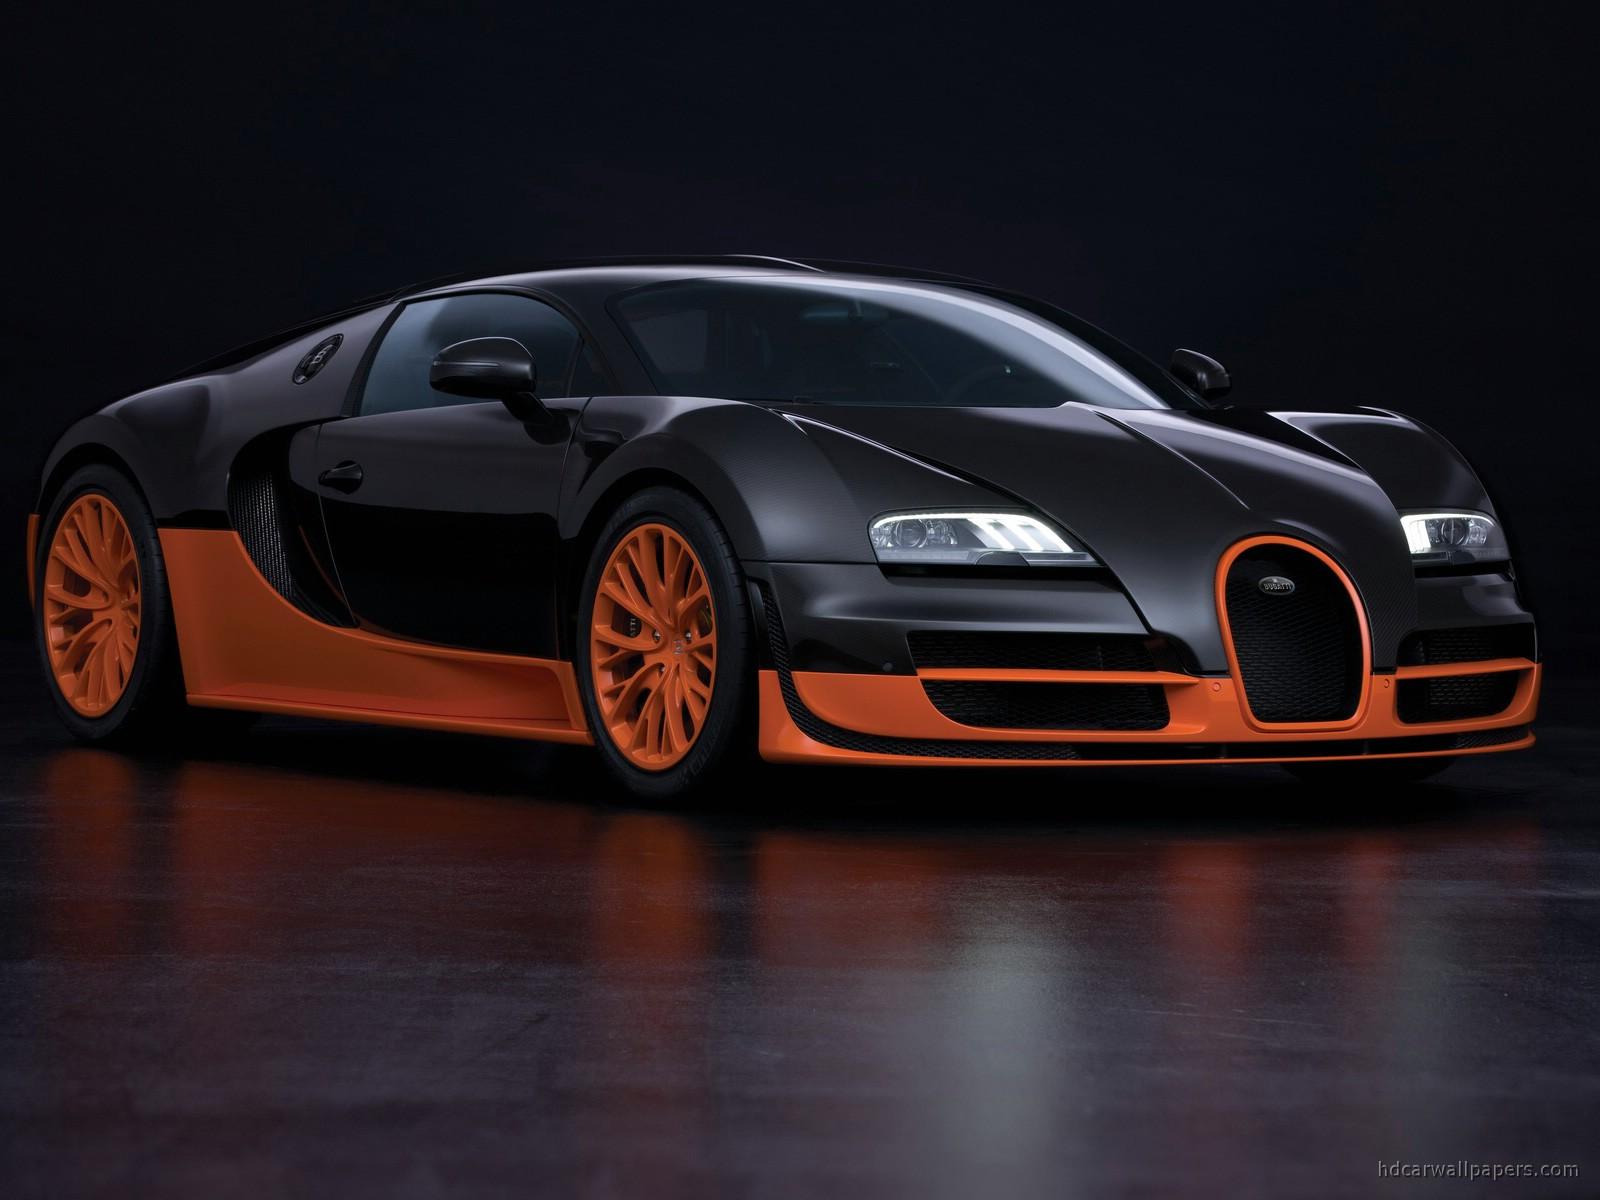 bugatti_veyron_16_4_super_sport-normal Outstanding Bugatti Veyron Price In Kolkata Cars Trend